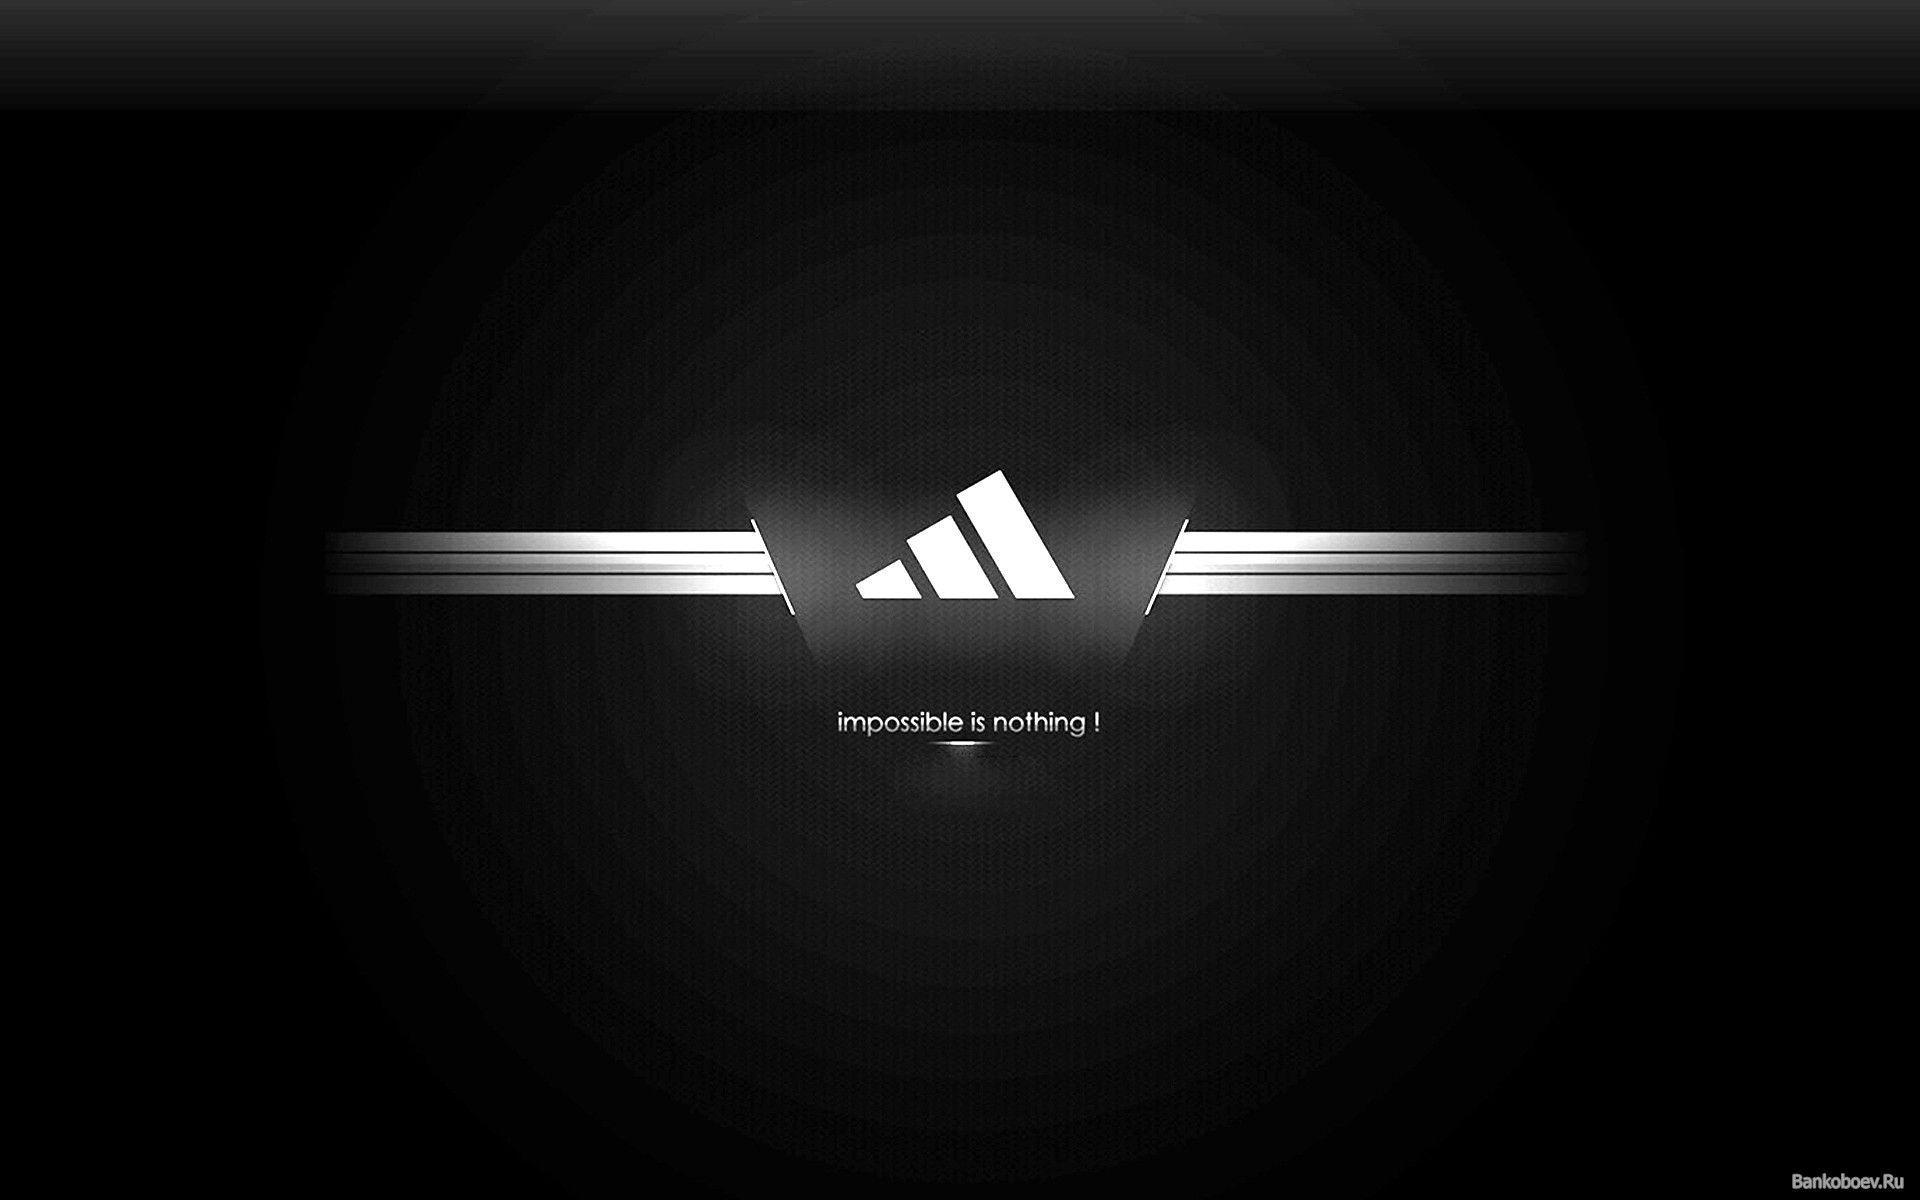 Adidas Wallpapers Black Wallpaper Cave